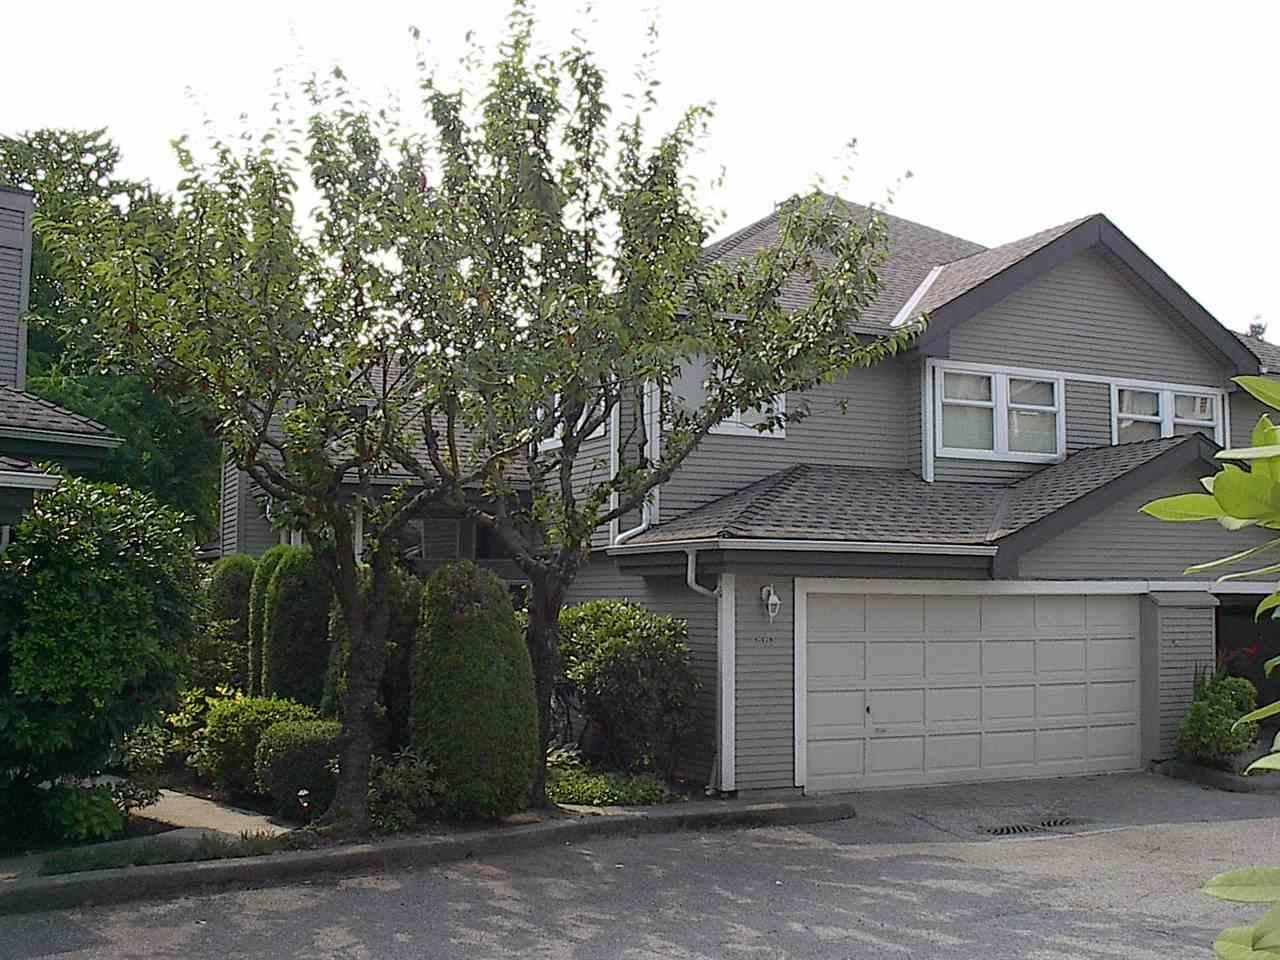 861 ROCHE POINT DRIVE, North Vancouver, BC V7H 2W5